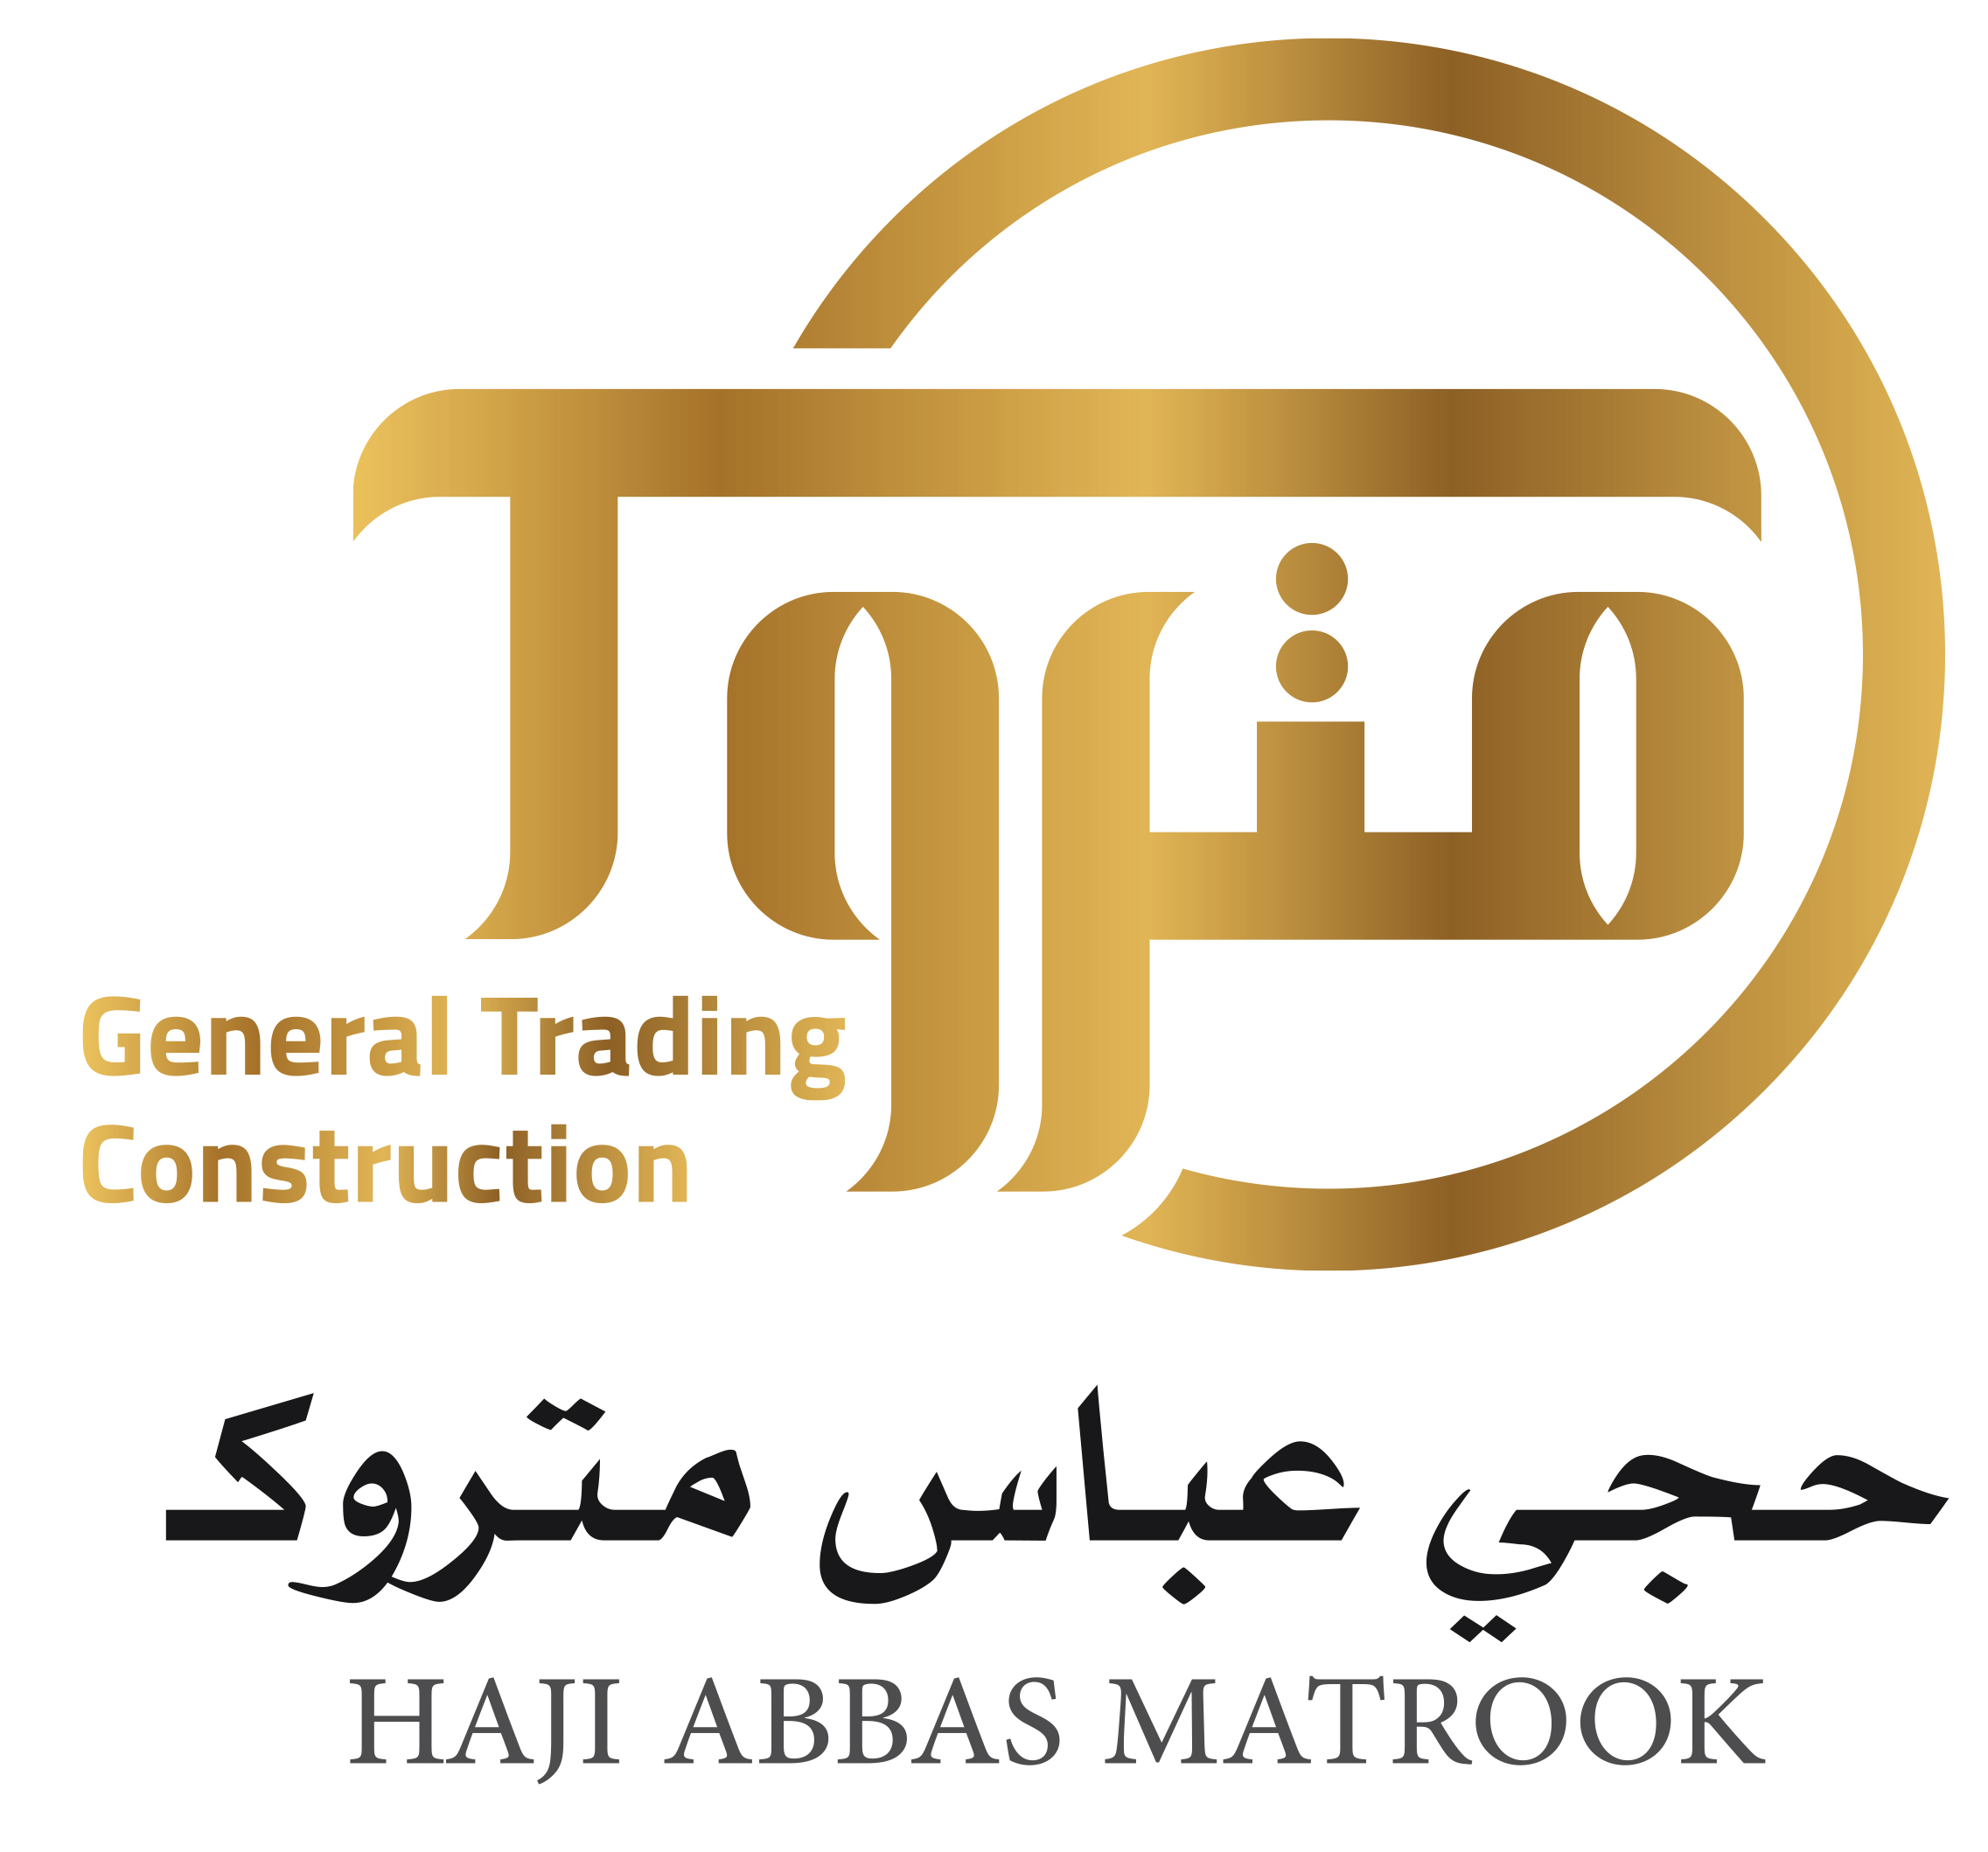 Haji Abbas Matrook General Trading & Construction